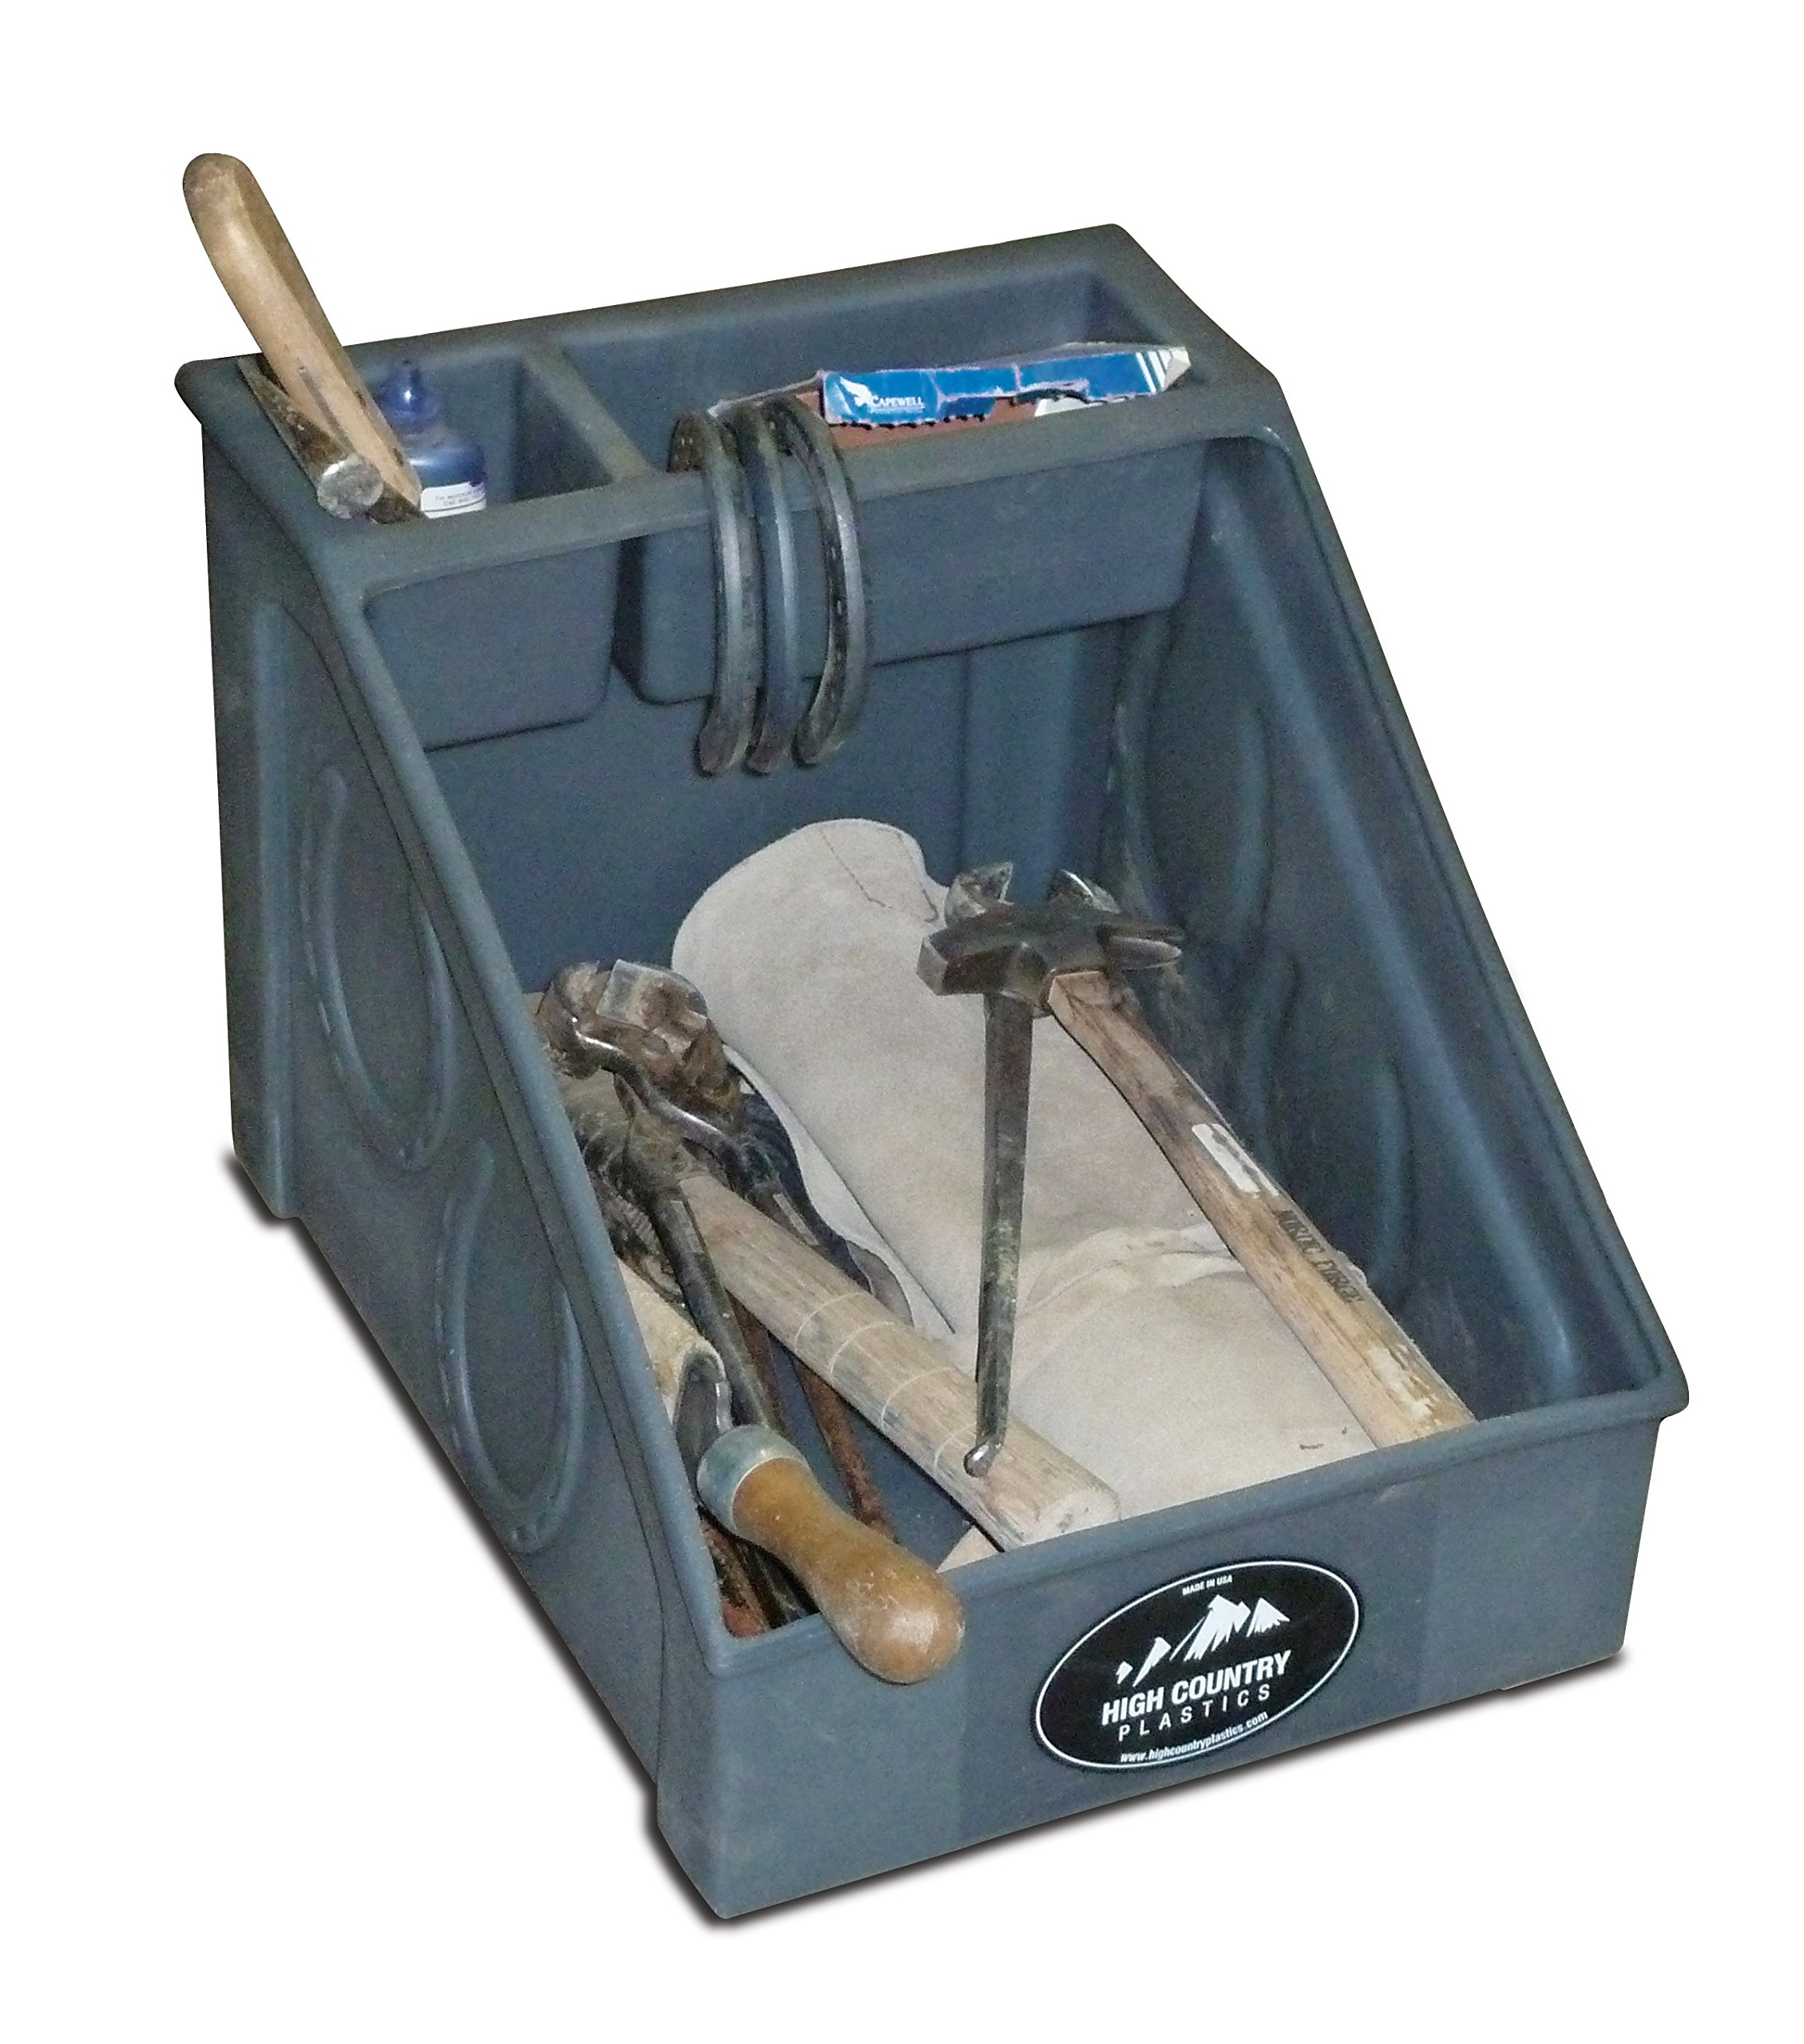 High Country Plastics Farrier Box - Maintenance Box by High Country Plastics